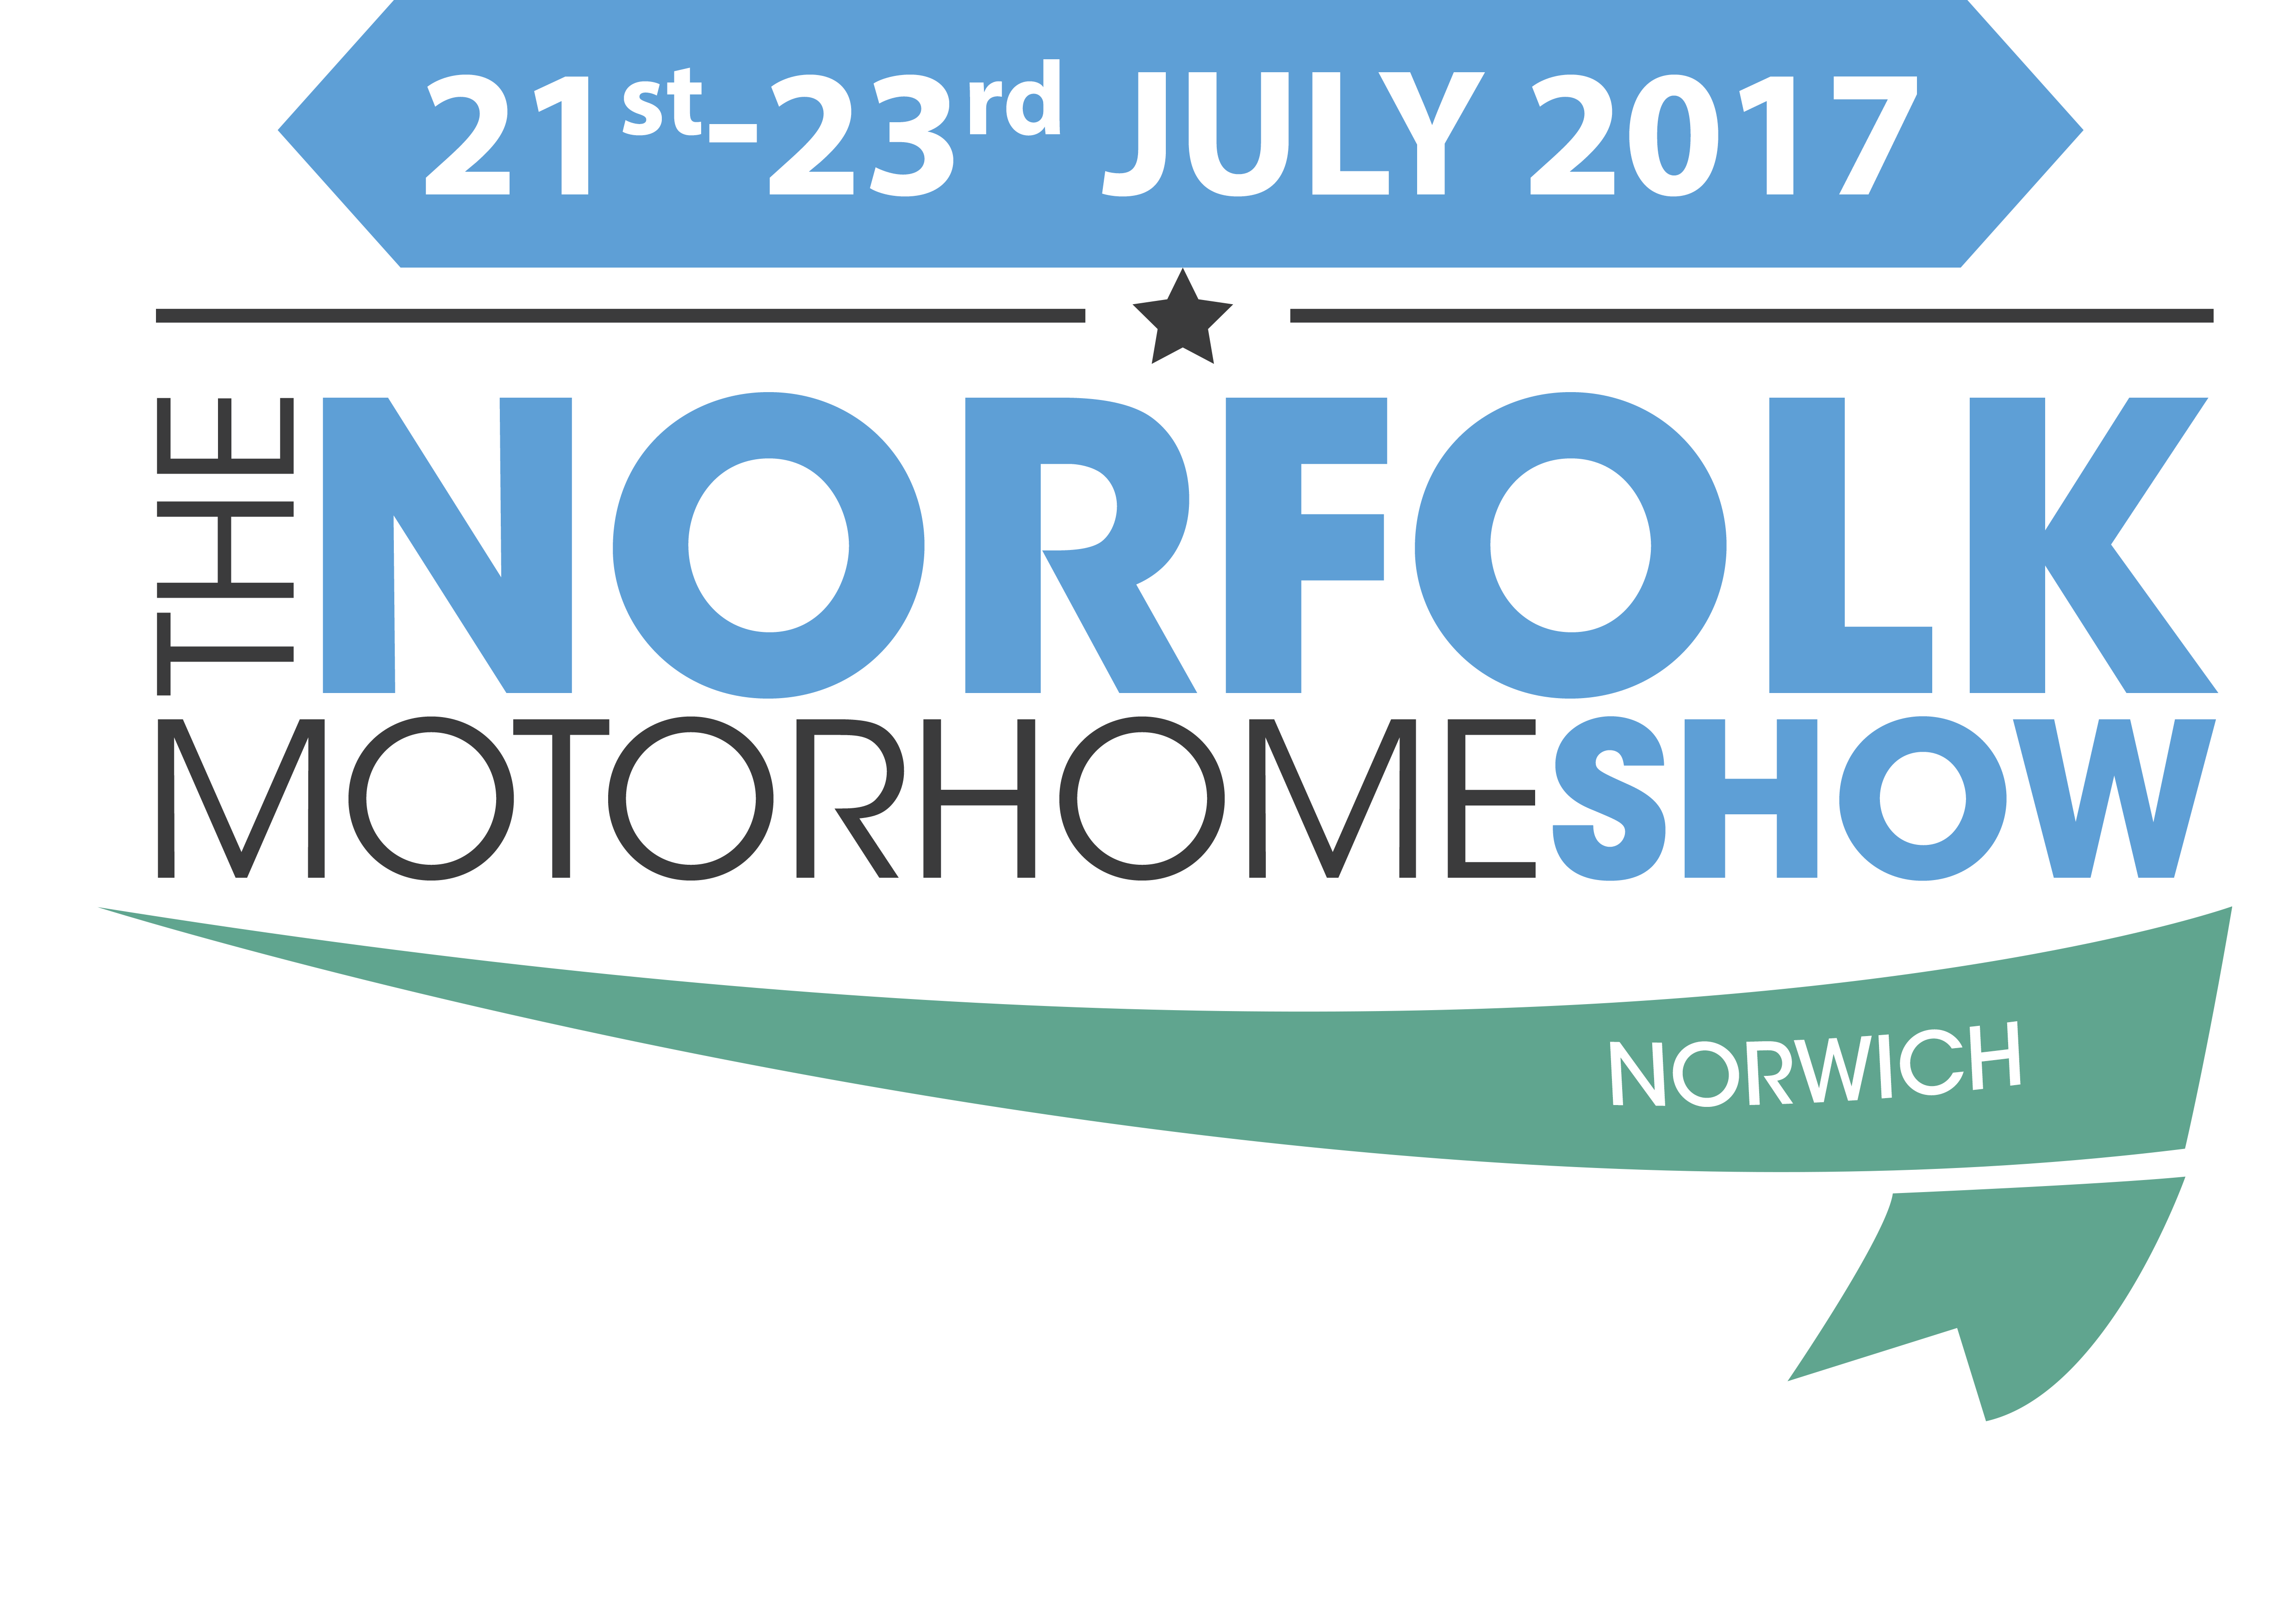 norfolk-2017-bigger-dates